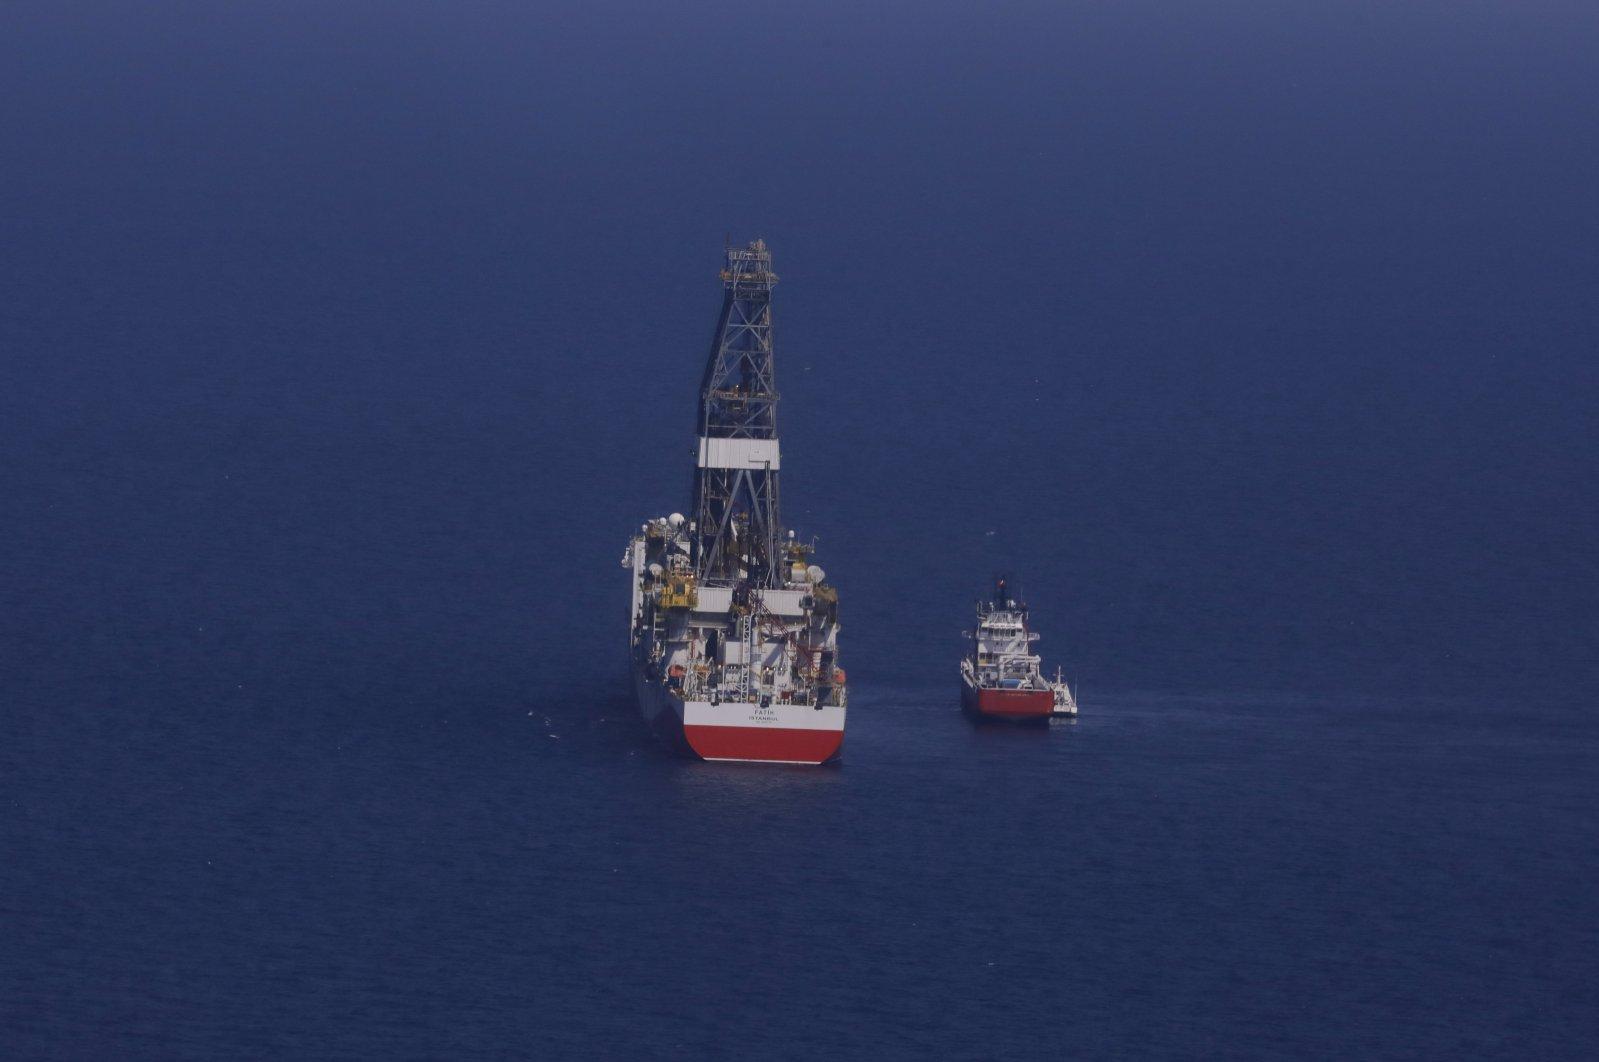 Turkey's drilling vessel Fatih is seen in the Black Sea, off the coast of Turkey, Aug. 21, 2020. (AA Photo)